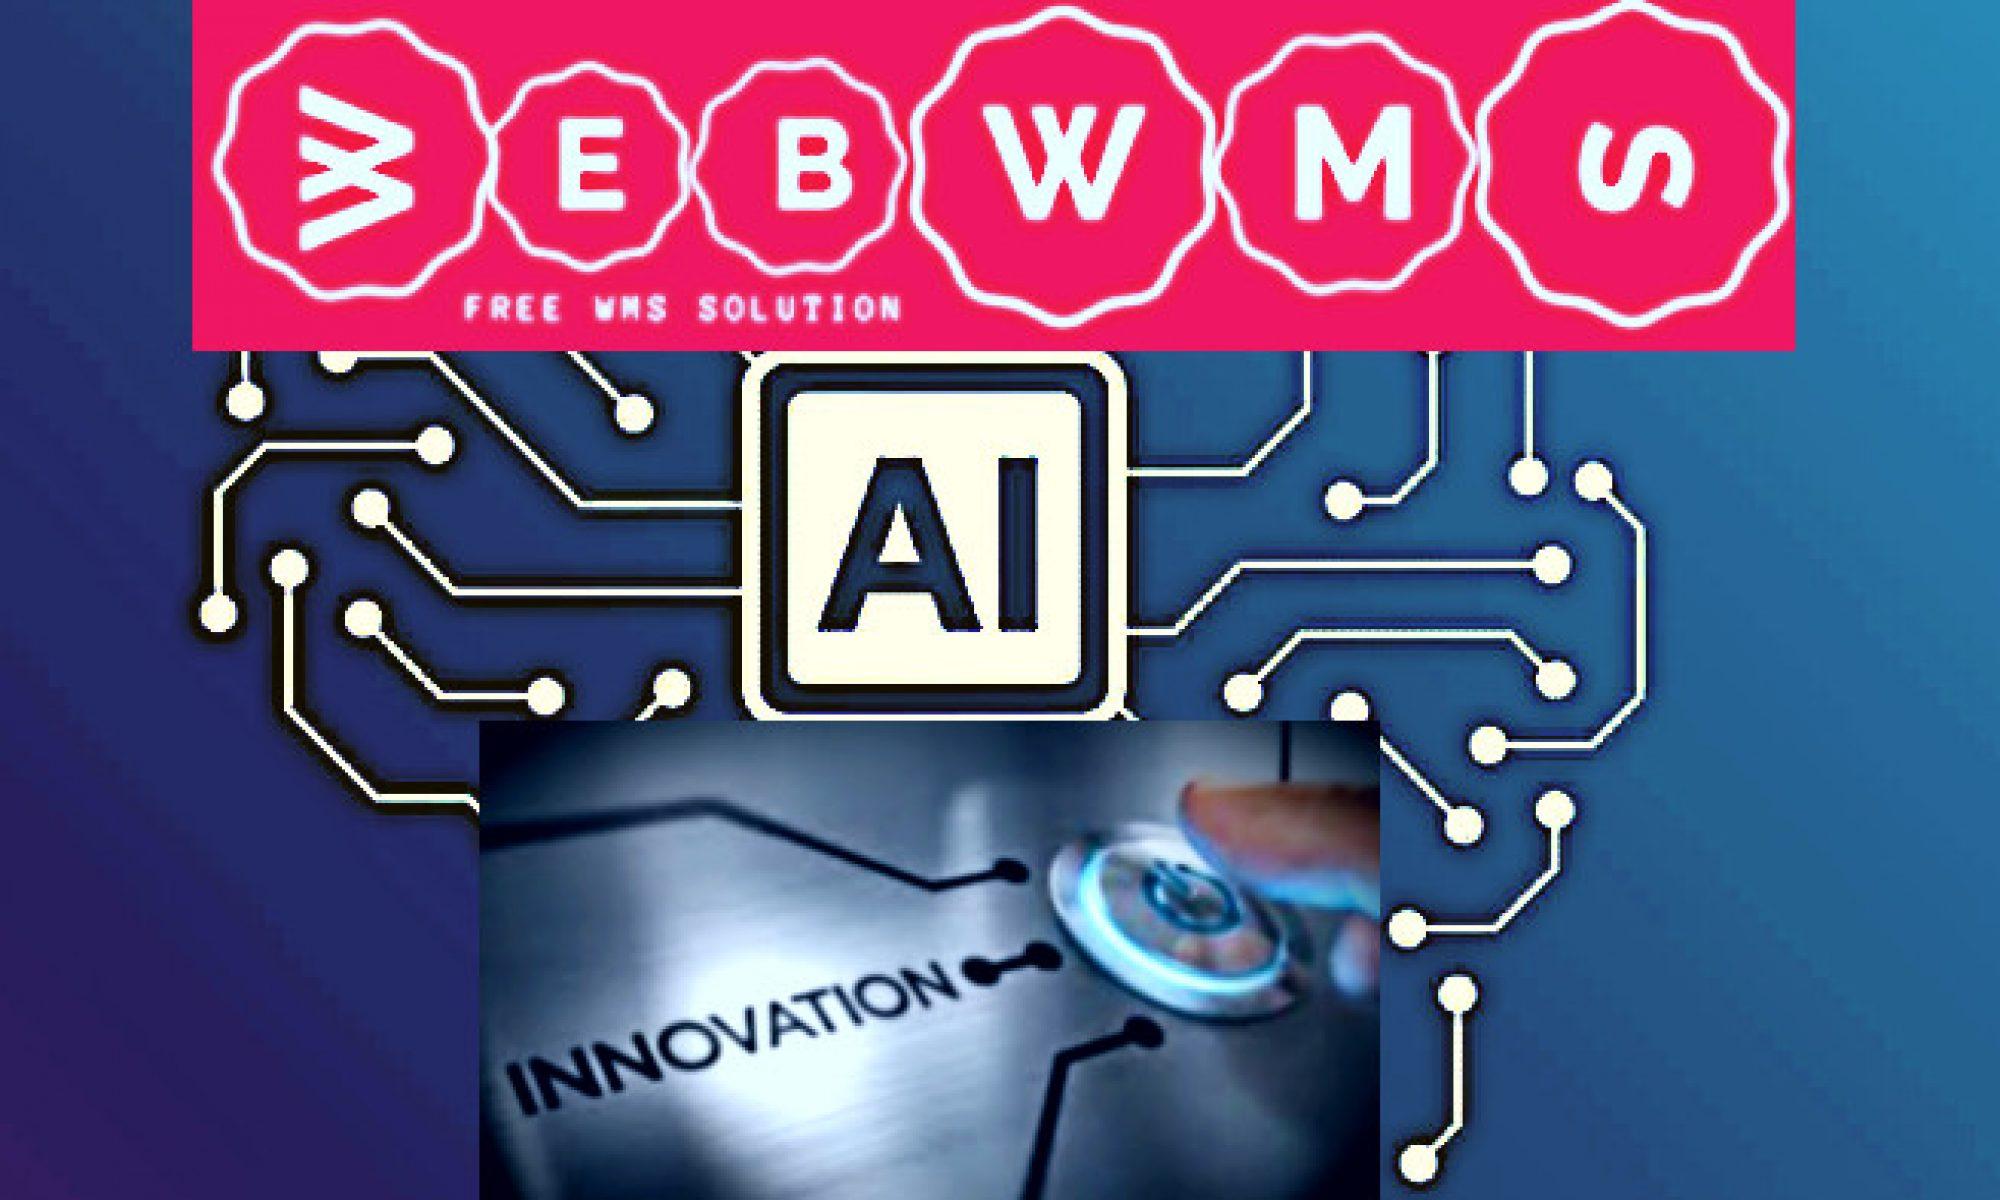 WebWMS - solutie gratuita WMS